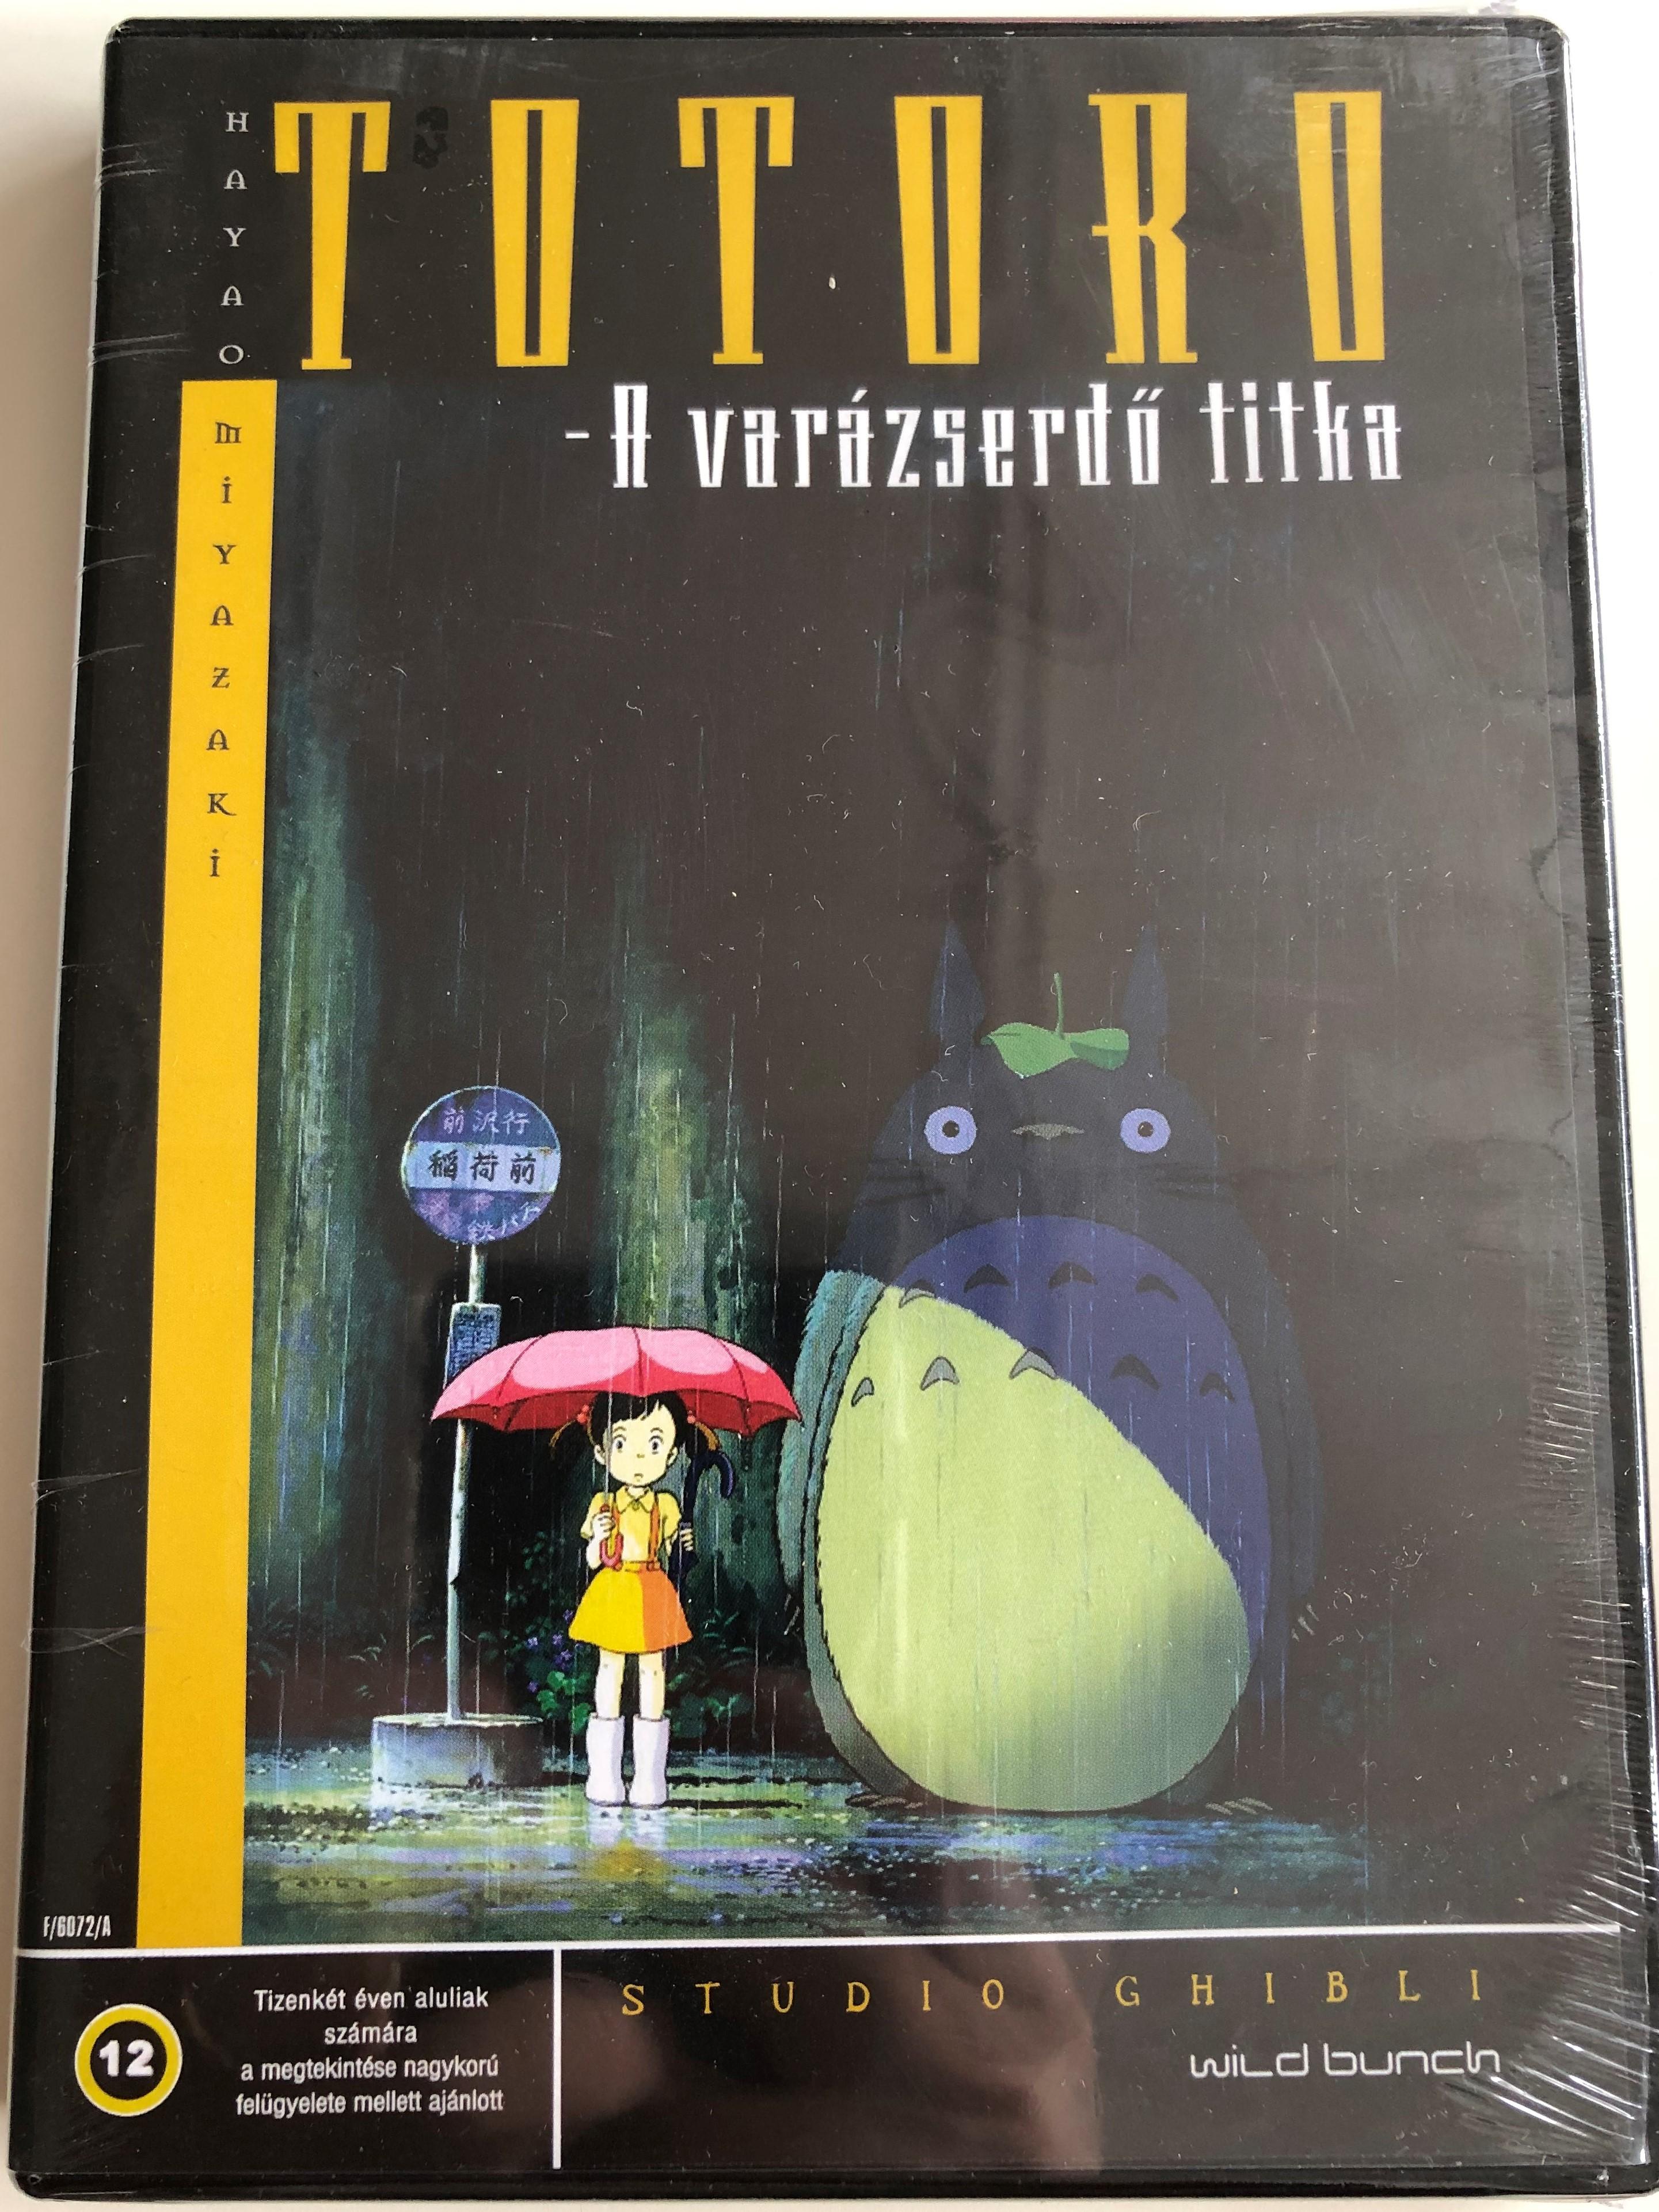 my-neighbour-totoro-dvd-1988-totoro-a-var-zserd-titka-1.jpg